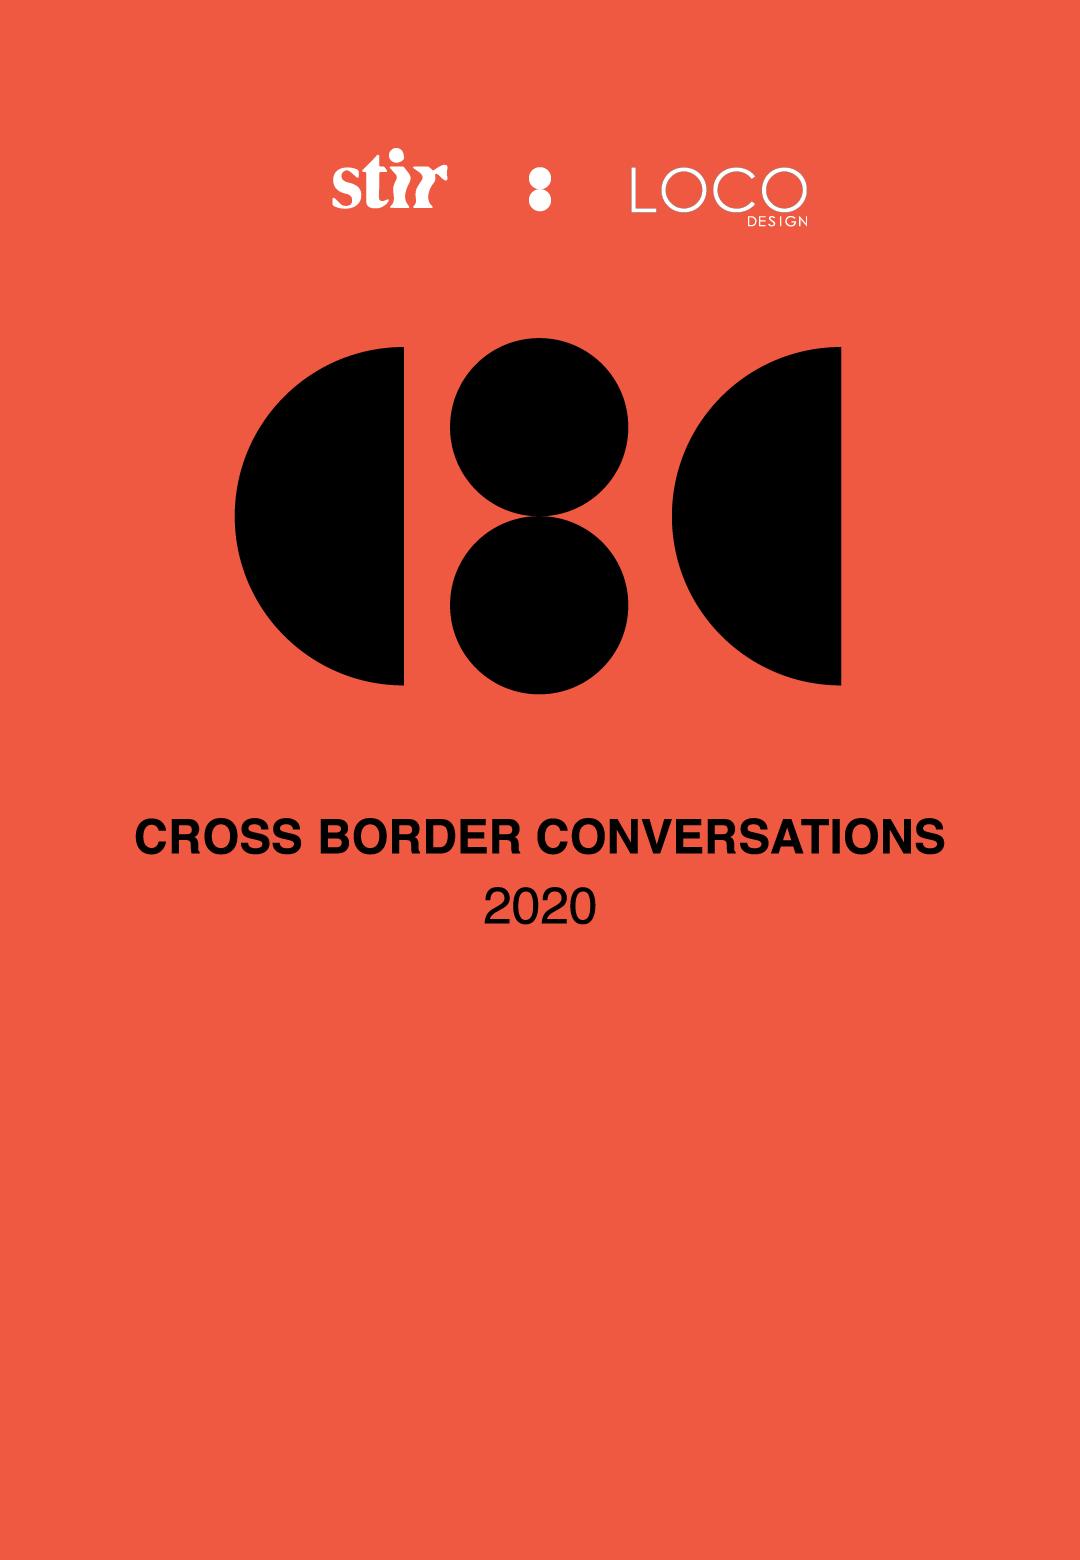 Cross Border Conversations | STIR X LOCO Design | STIRworld